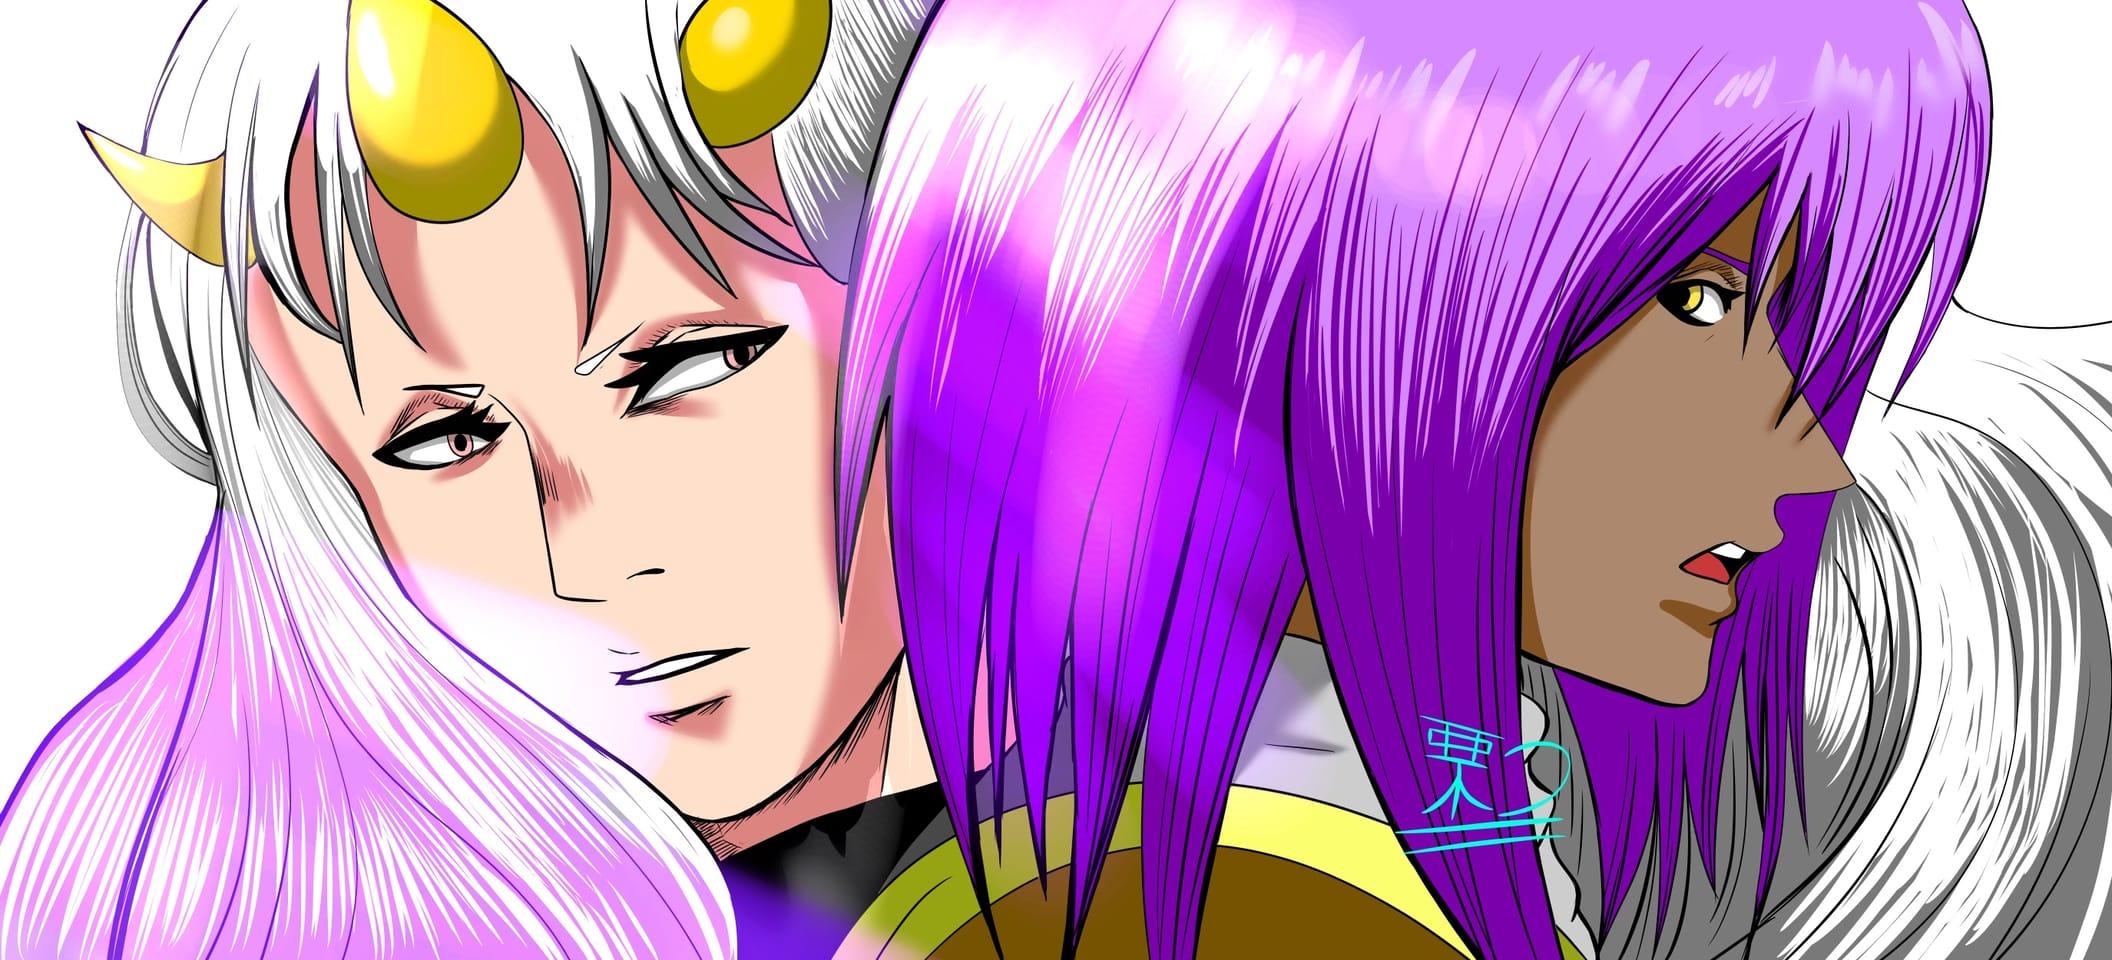 Uncertainty Illust of 栗つ🌰 oc manga villain whitehair medibang male Artwork purple